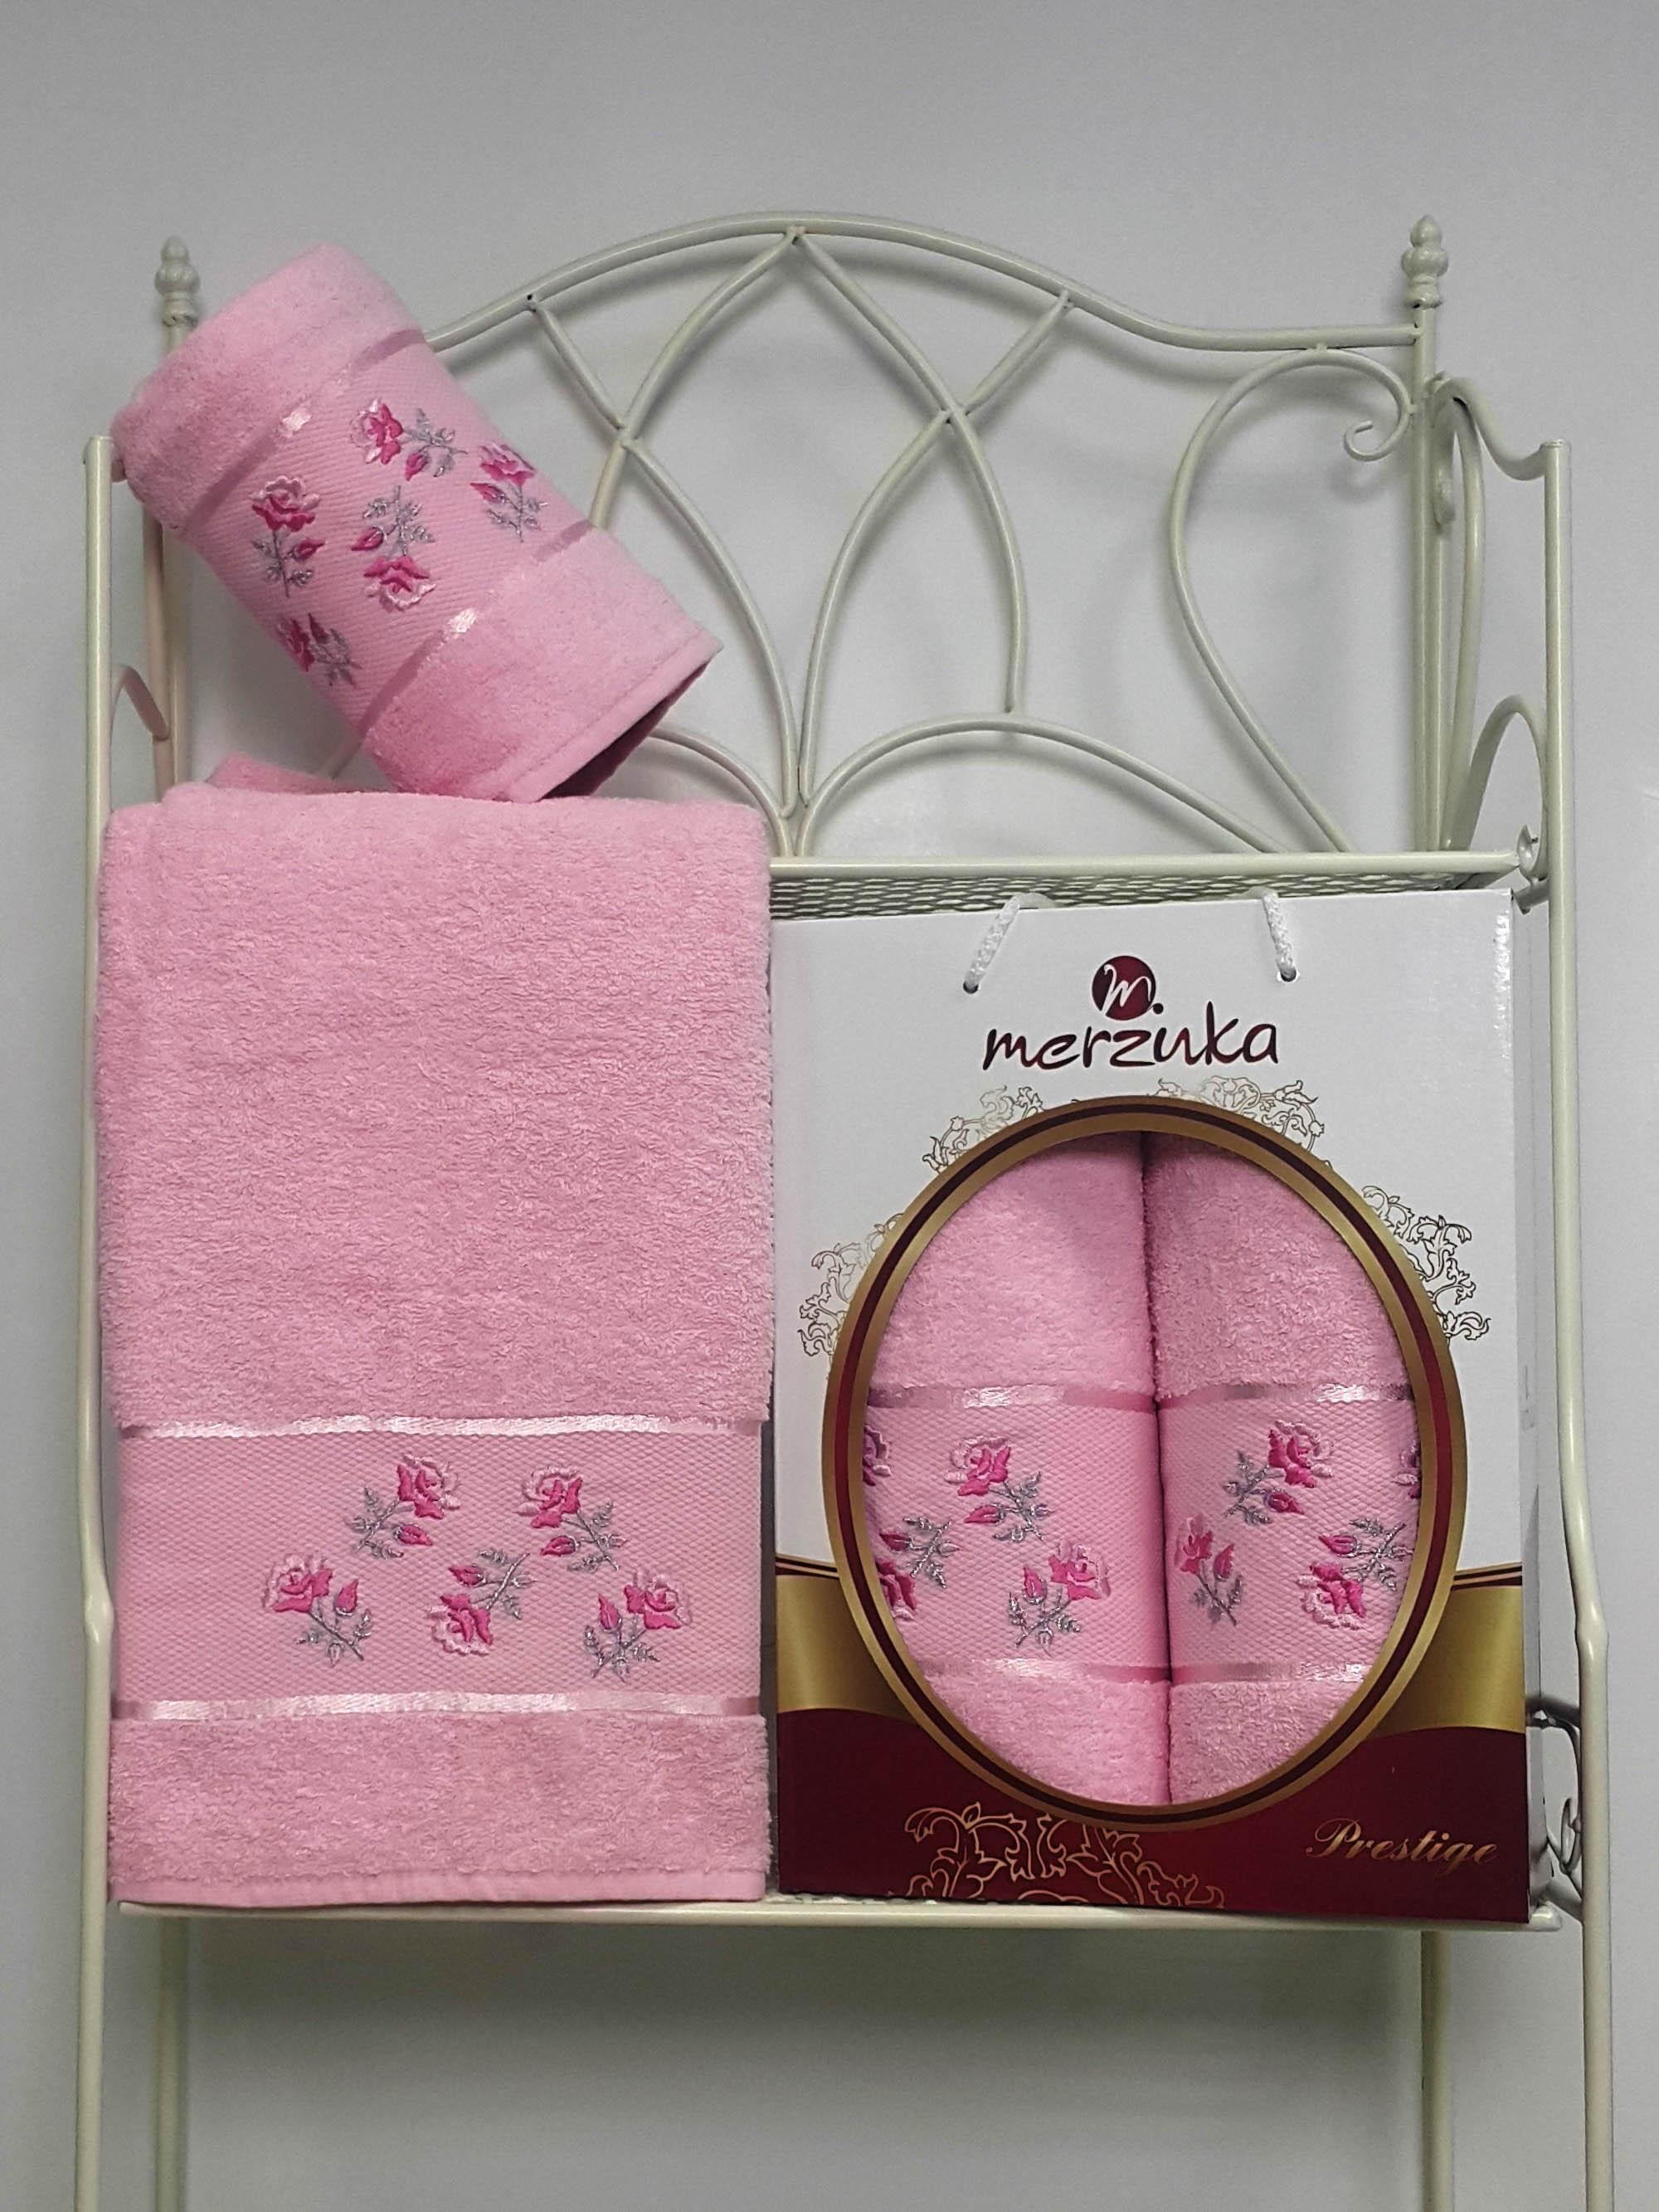 Полотенца Oran Merzuka Набор из 2 полотенец Prestij Цвет: Светло-Розовый набор из 3 полотенец merzuka sakura 50х90 2 70х140 8432 розовый